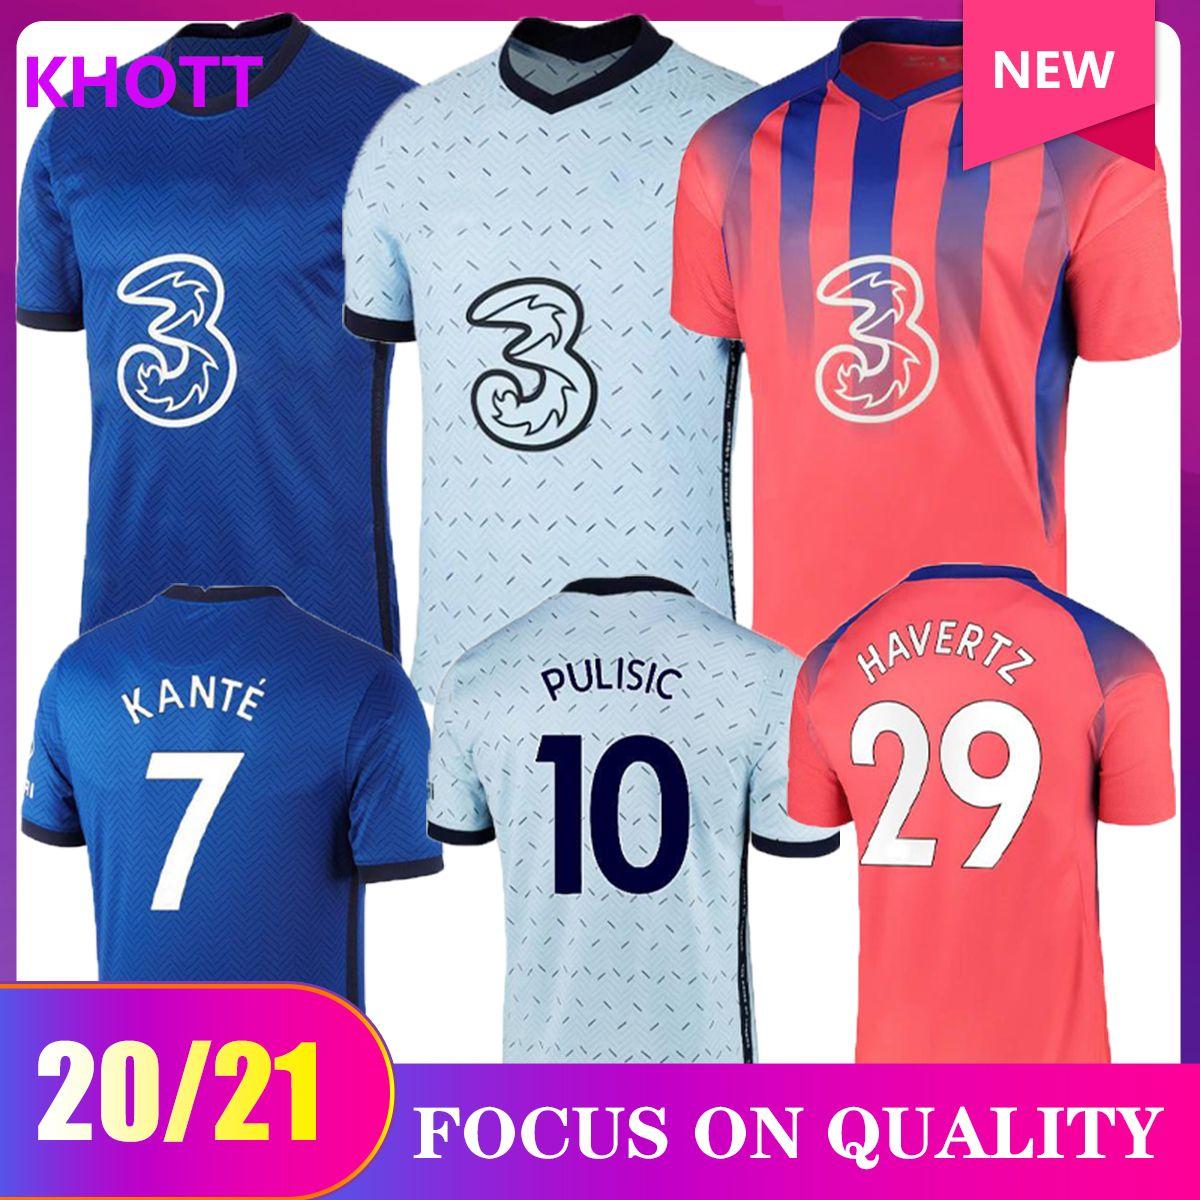 20 21 CFC Pulise Pulisic Jerseys 2020 2021 Abraham Mount Willian Lampard Camicia da calcio Set Hudson Odoi Kante Uniformi uomo